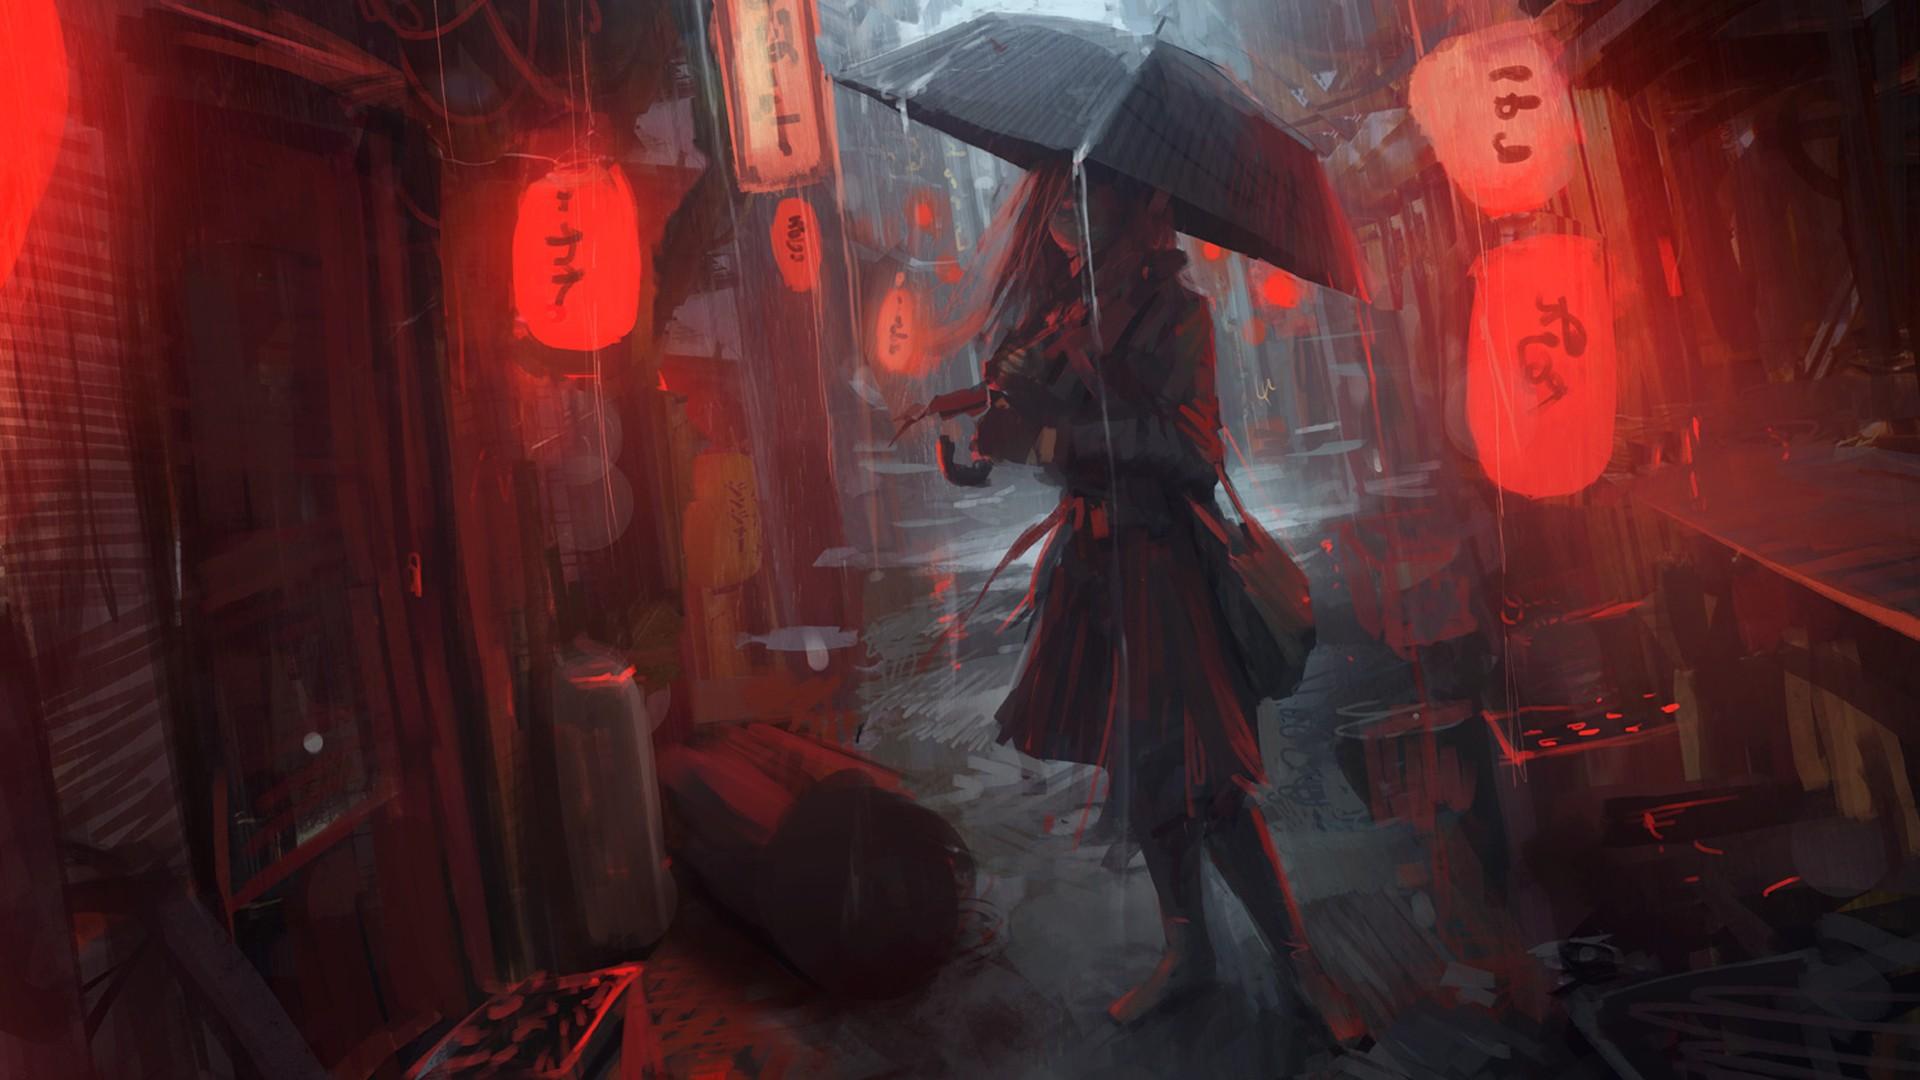 Women Anime Girls Red Artwork Umbrella Lantern Japanese Midnight Oldboy Darkness Screenshot Computer Wallpaper Pc Game